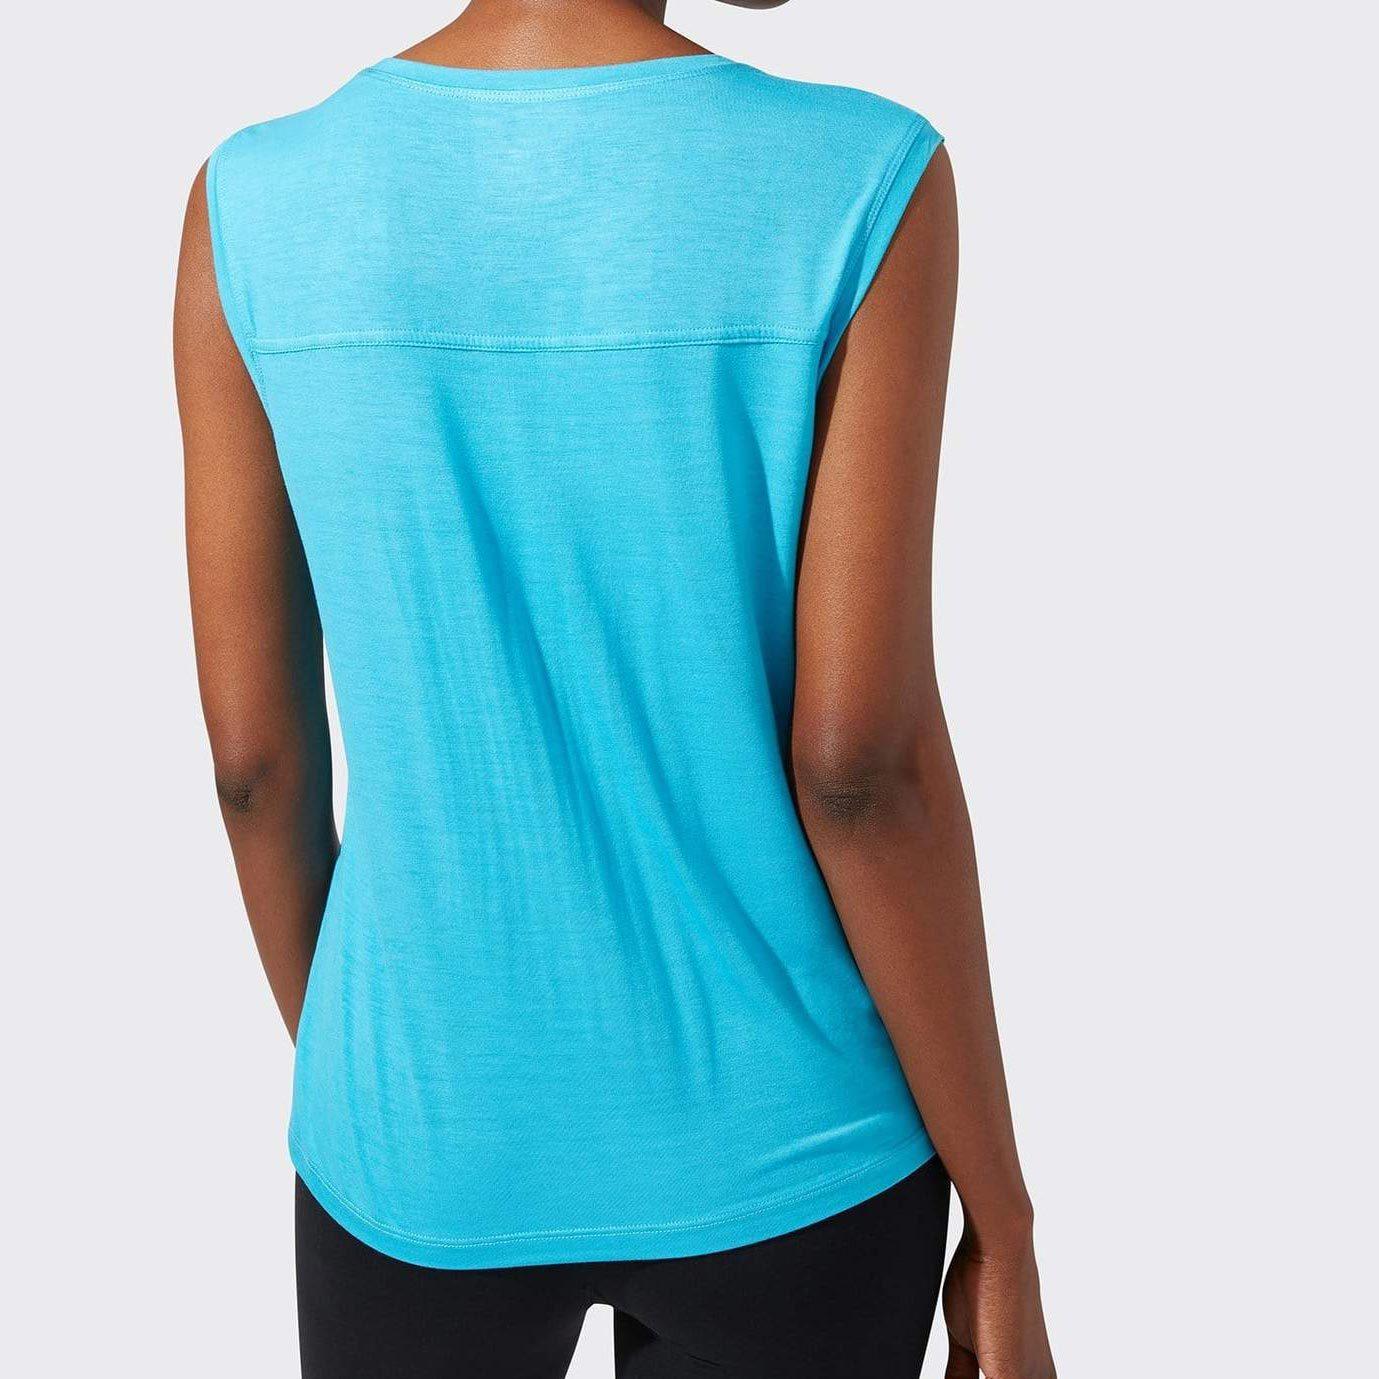 sleeveless tank top